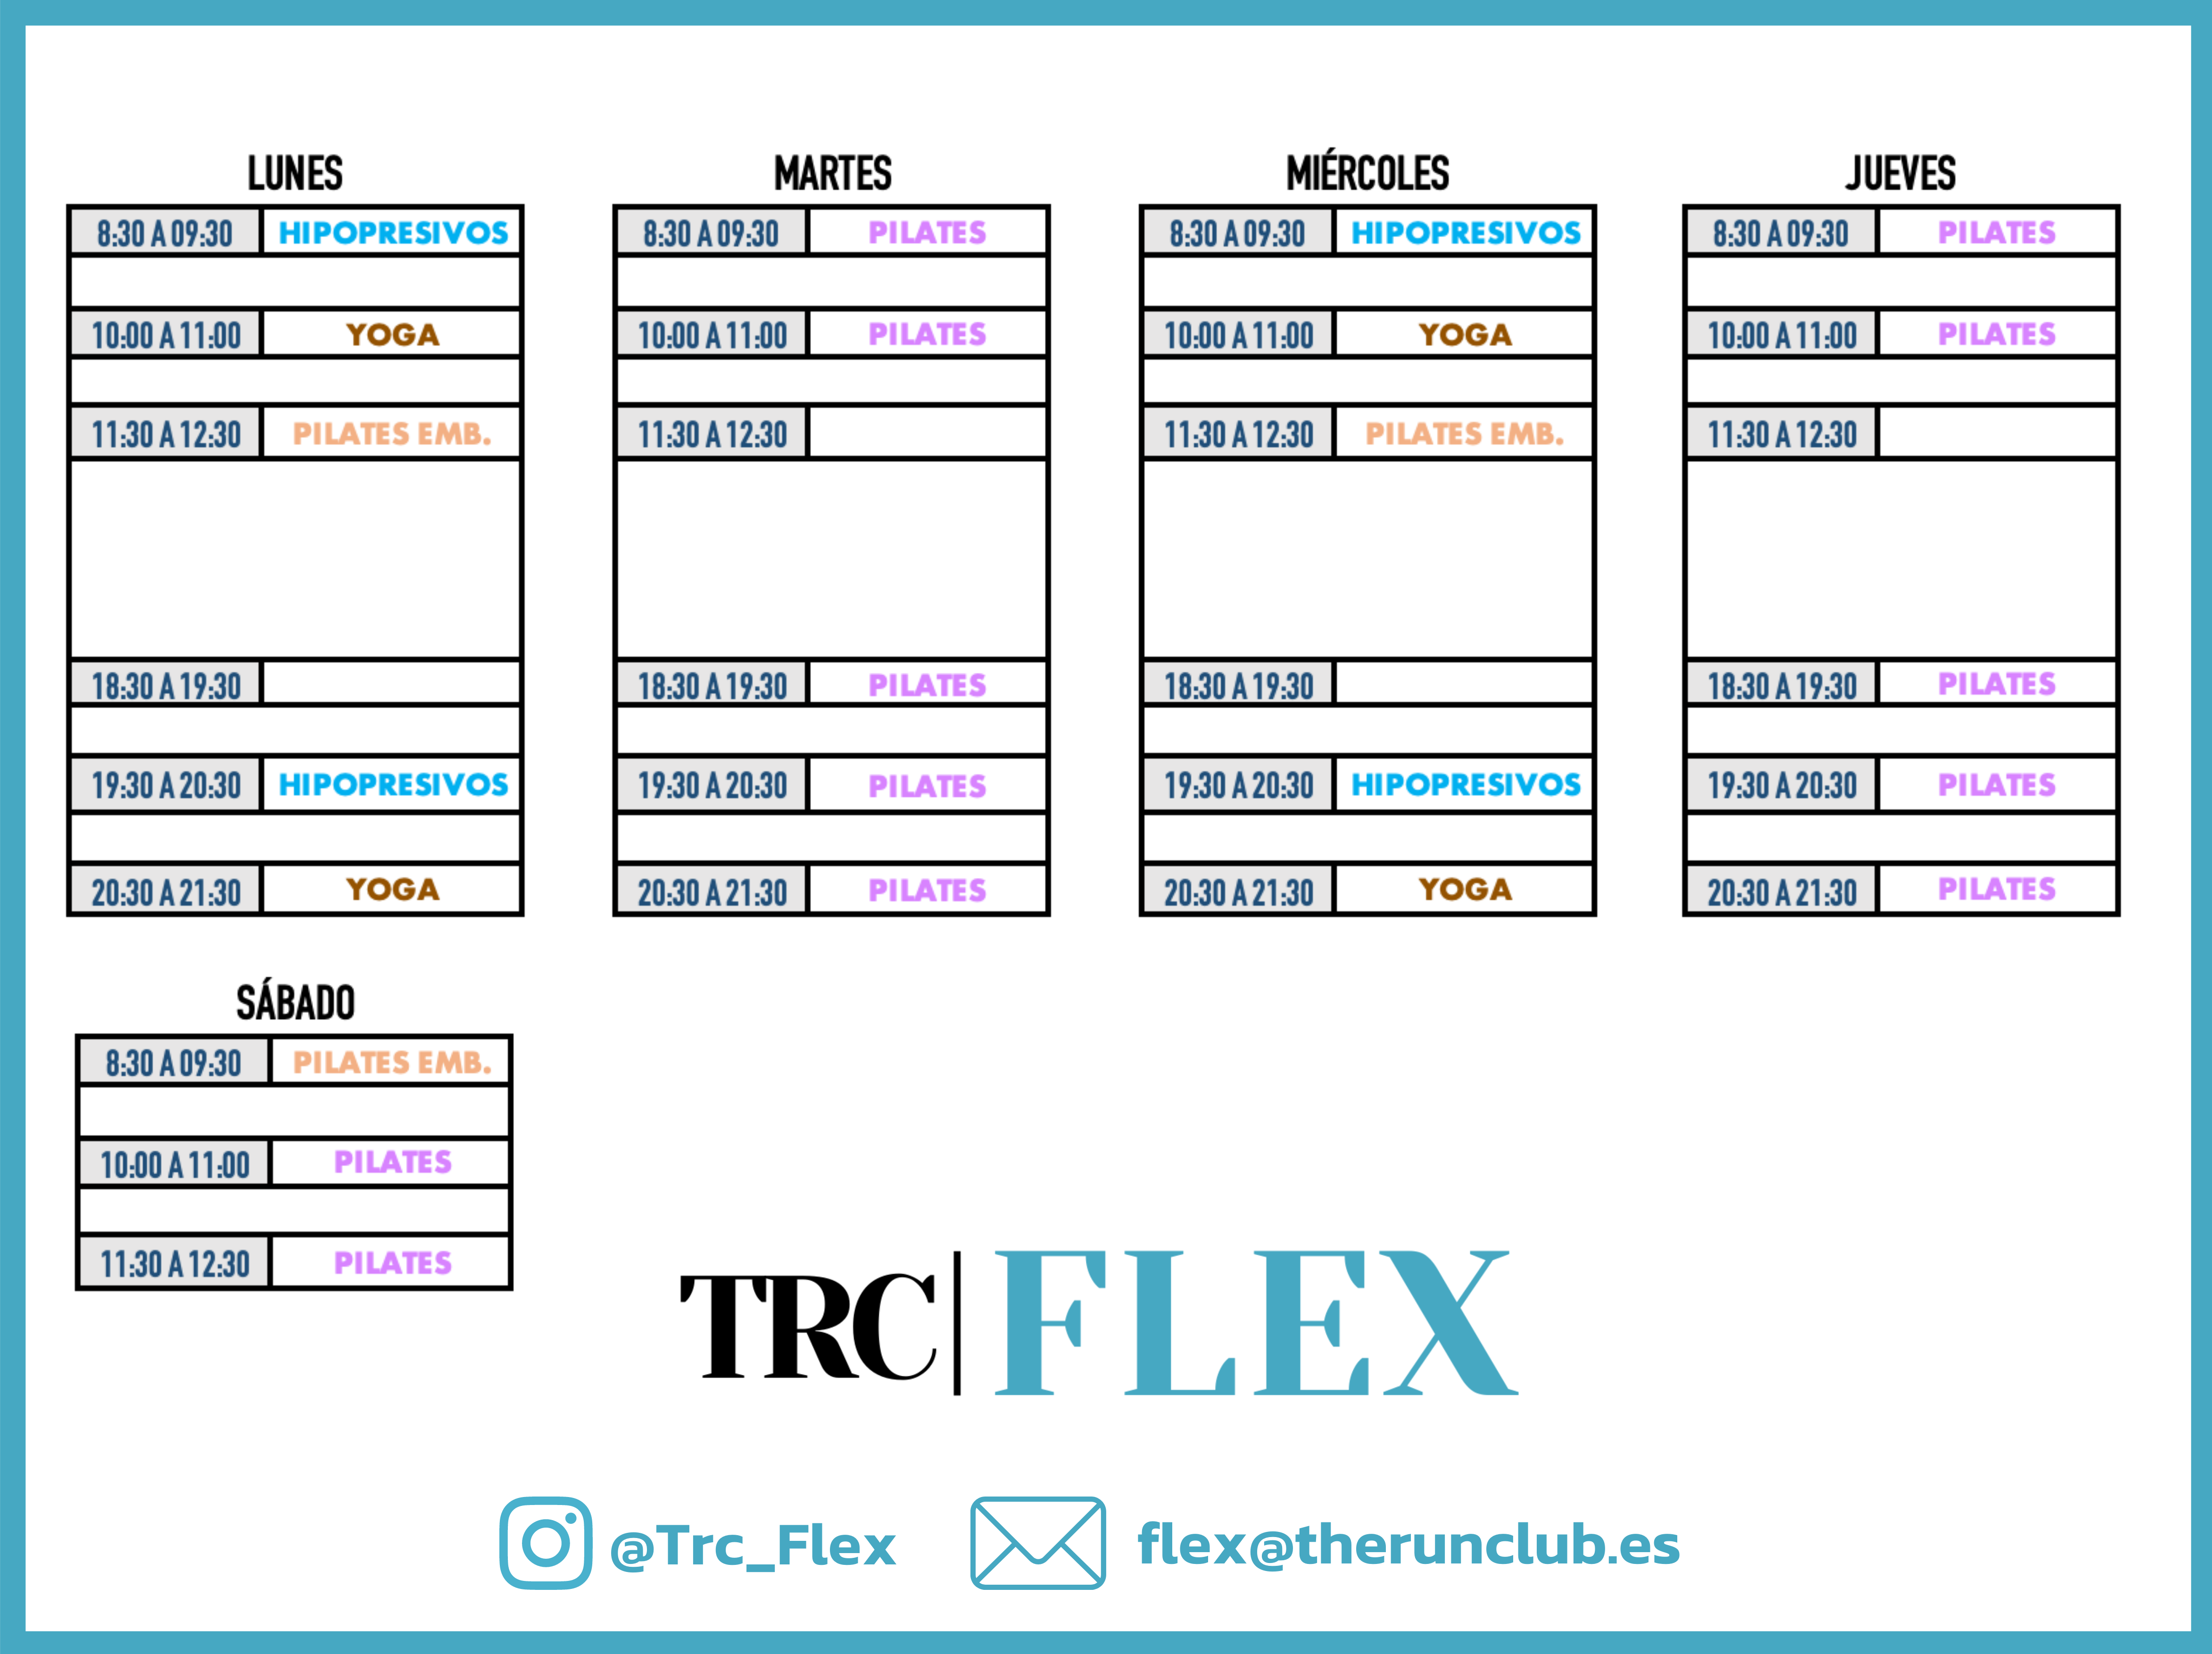 Horarios TRC Flex - Centro de Pilates - Yoga - Hipopresivos en Madrid - (3)